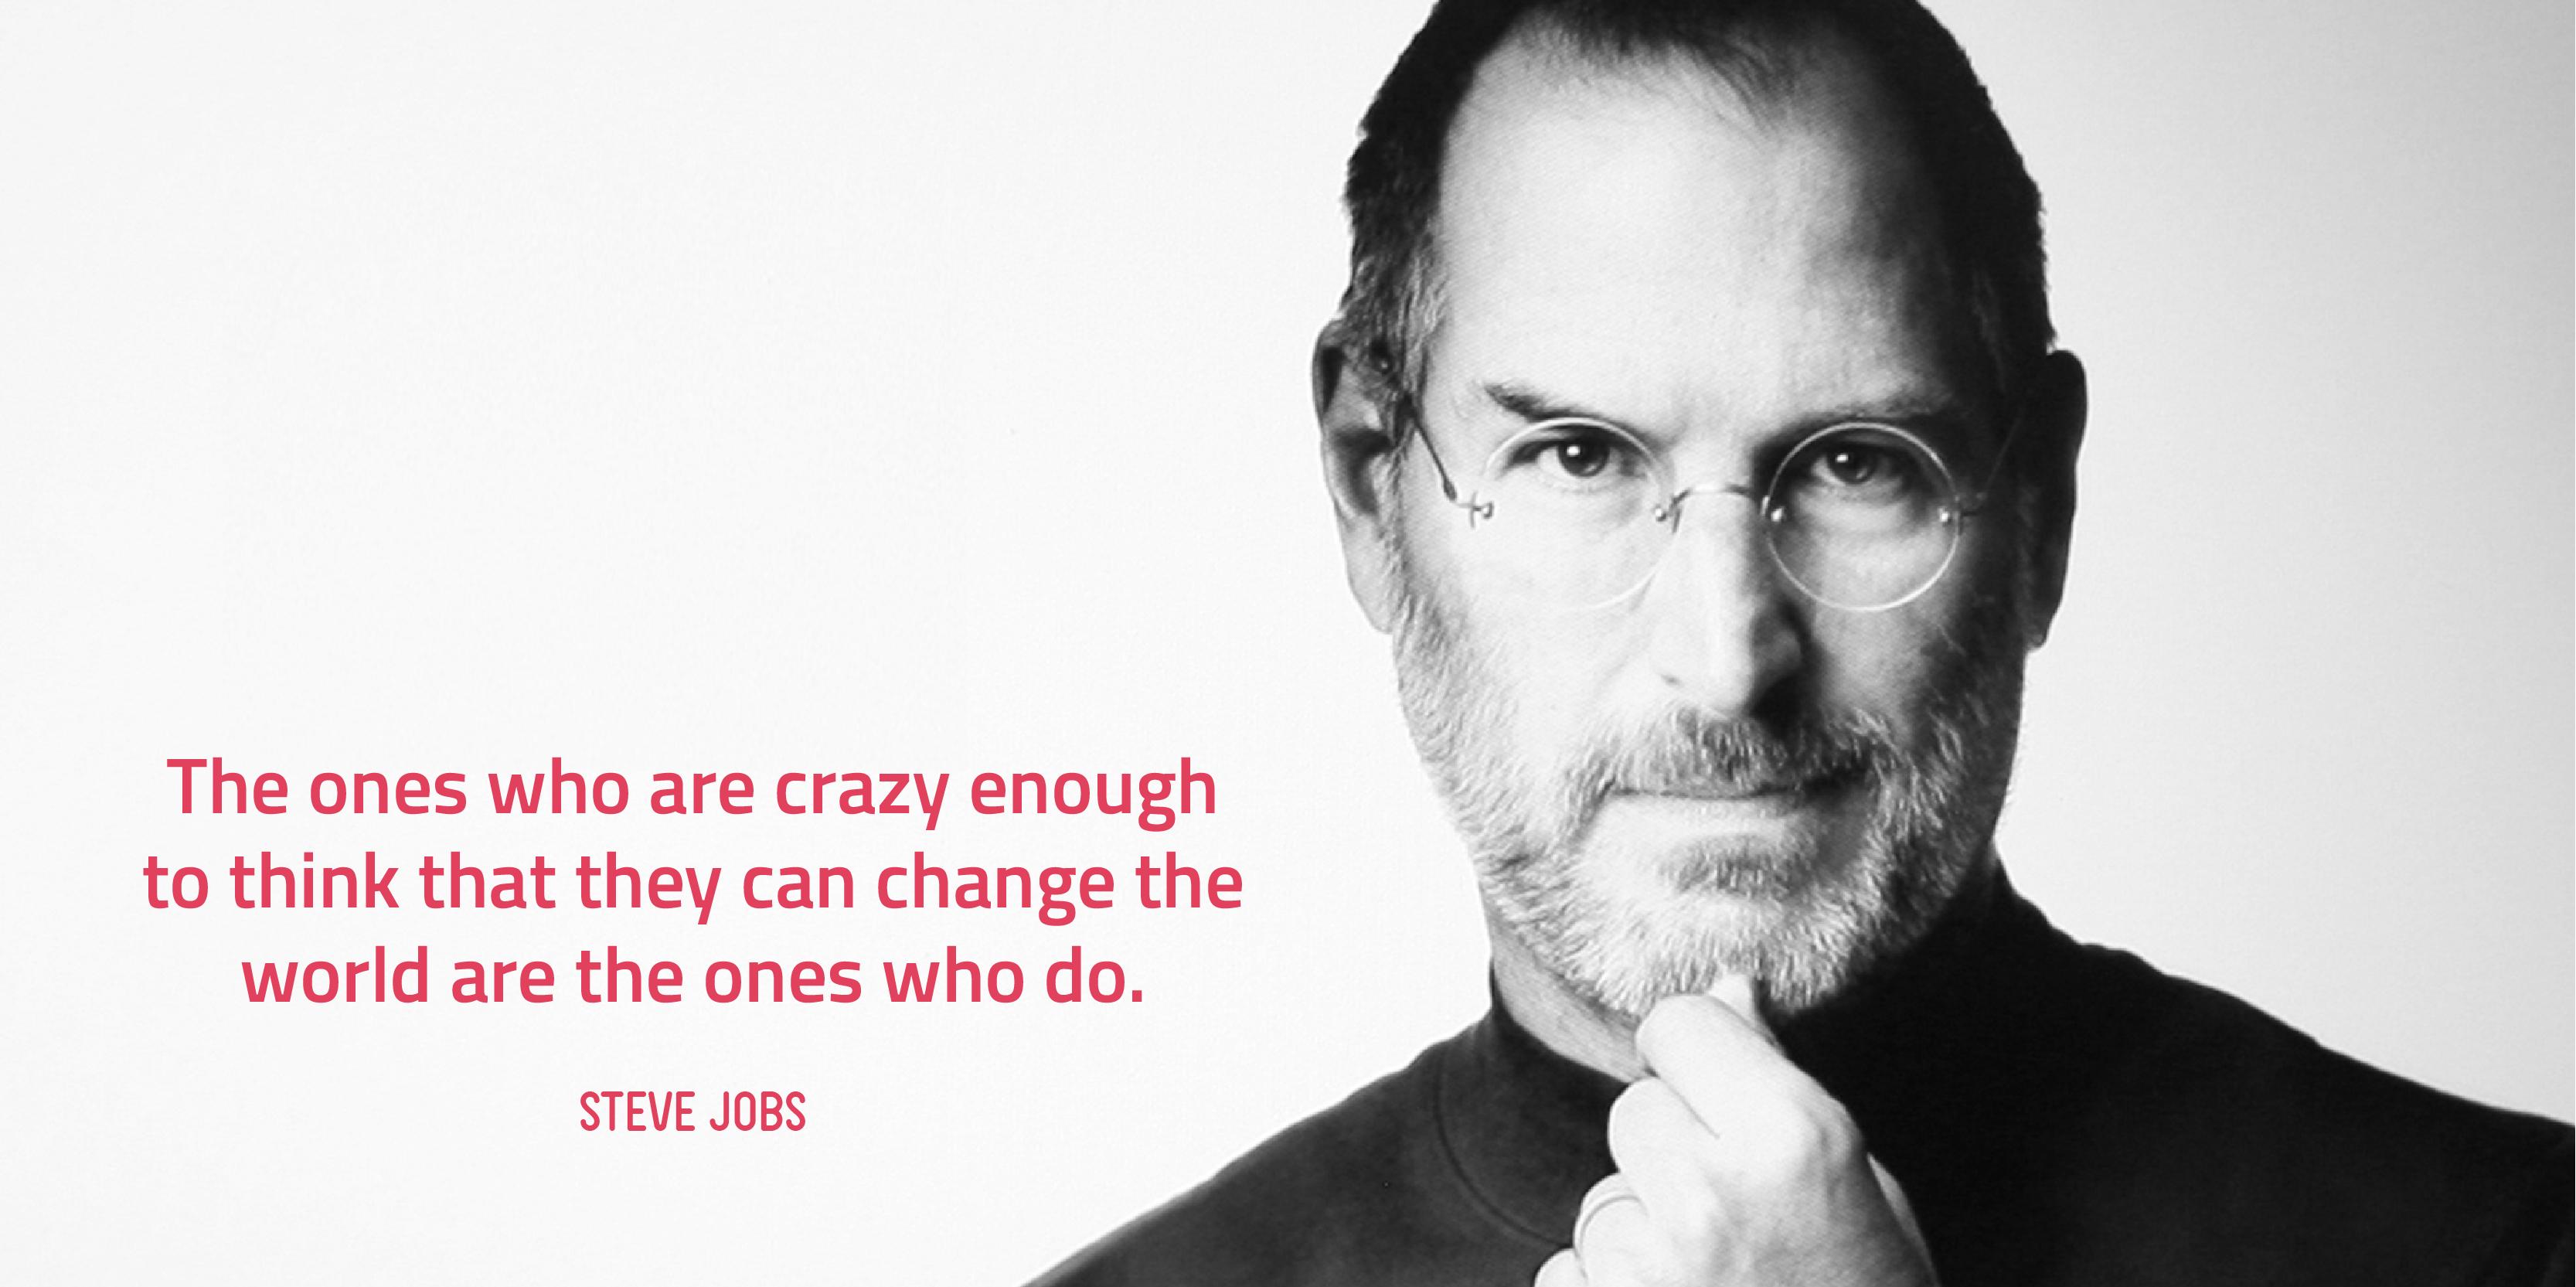 Work Life Balance Quotes Steve Jobs